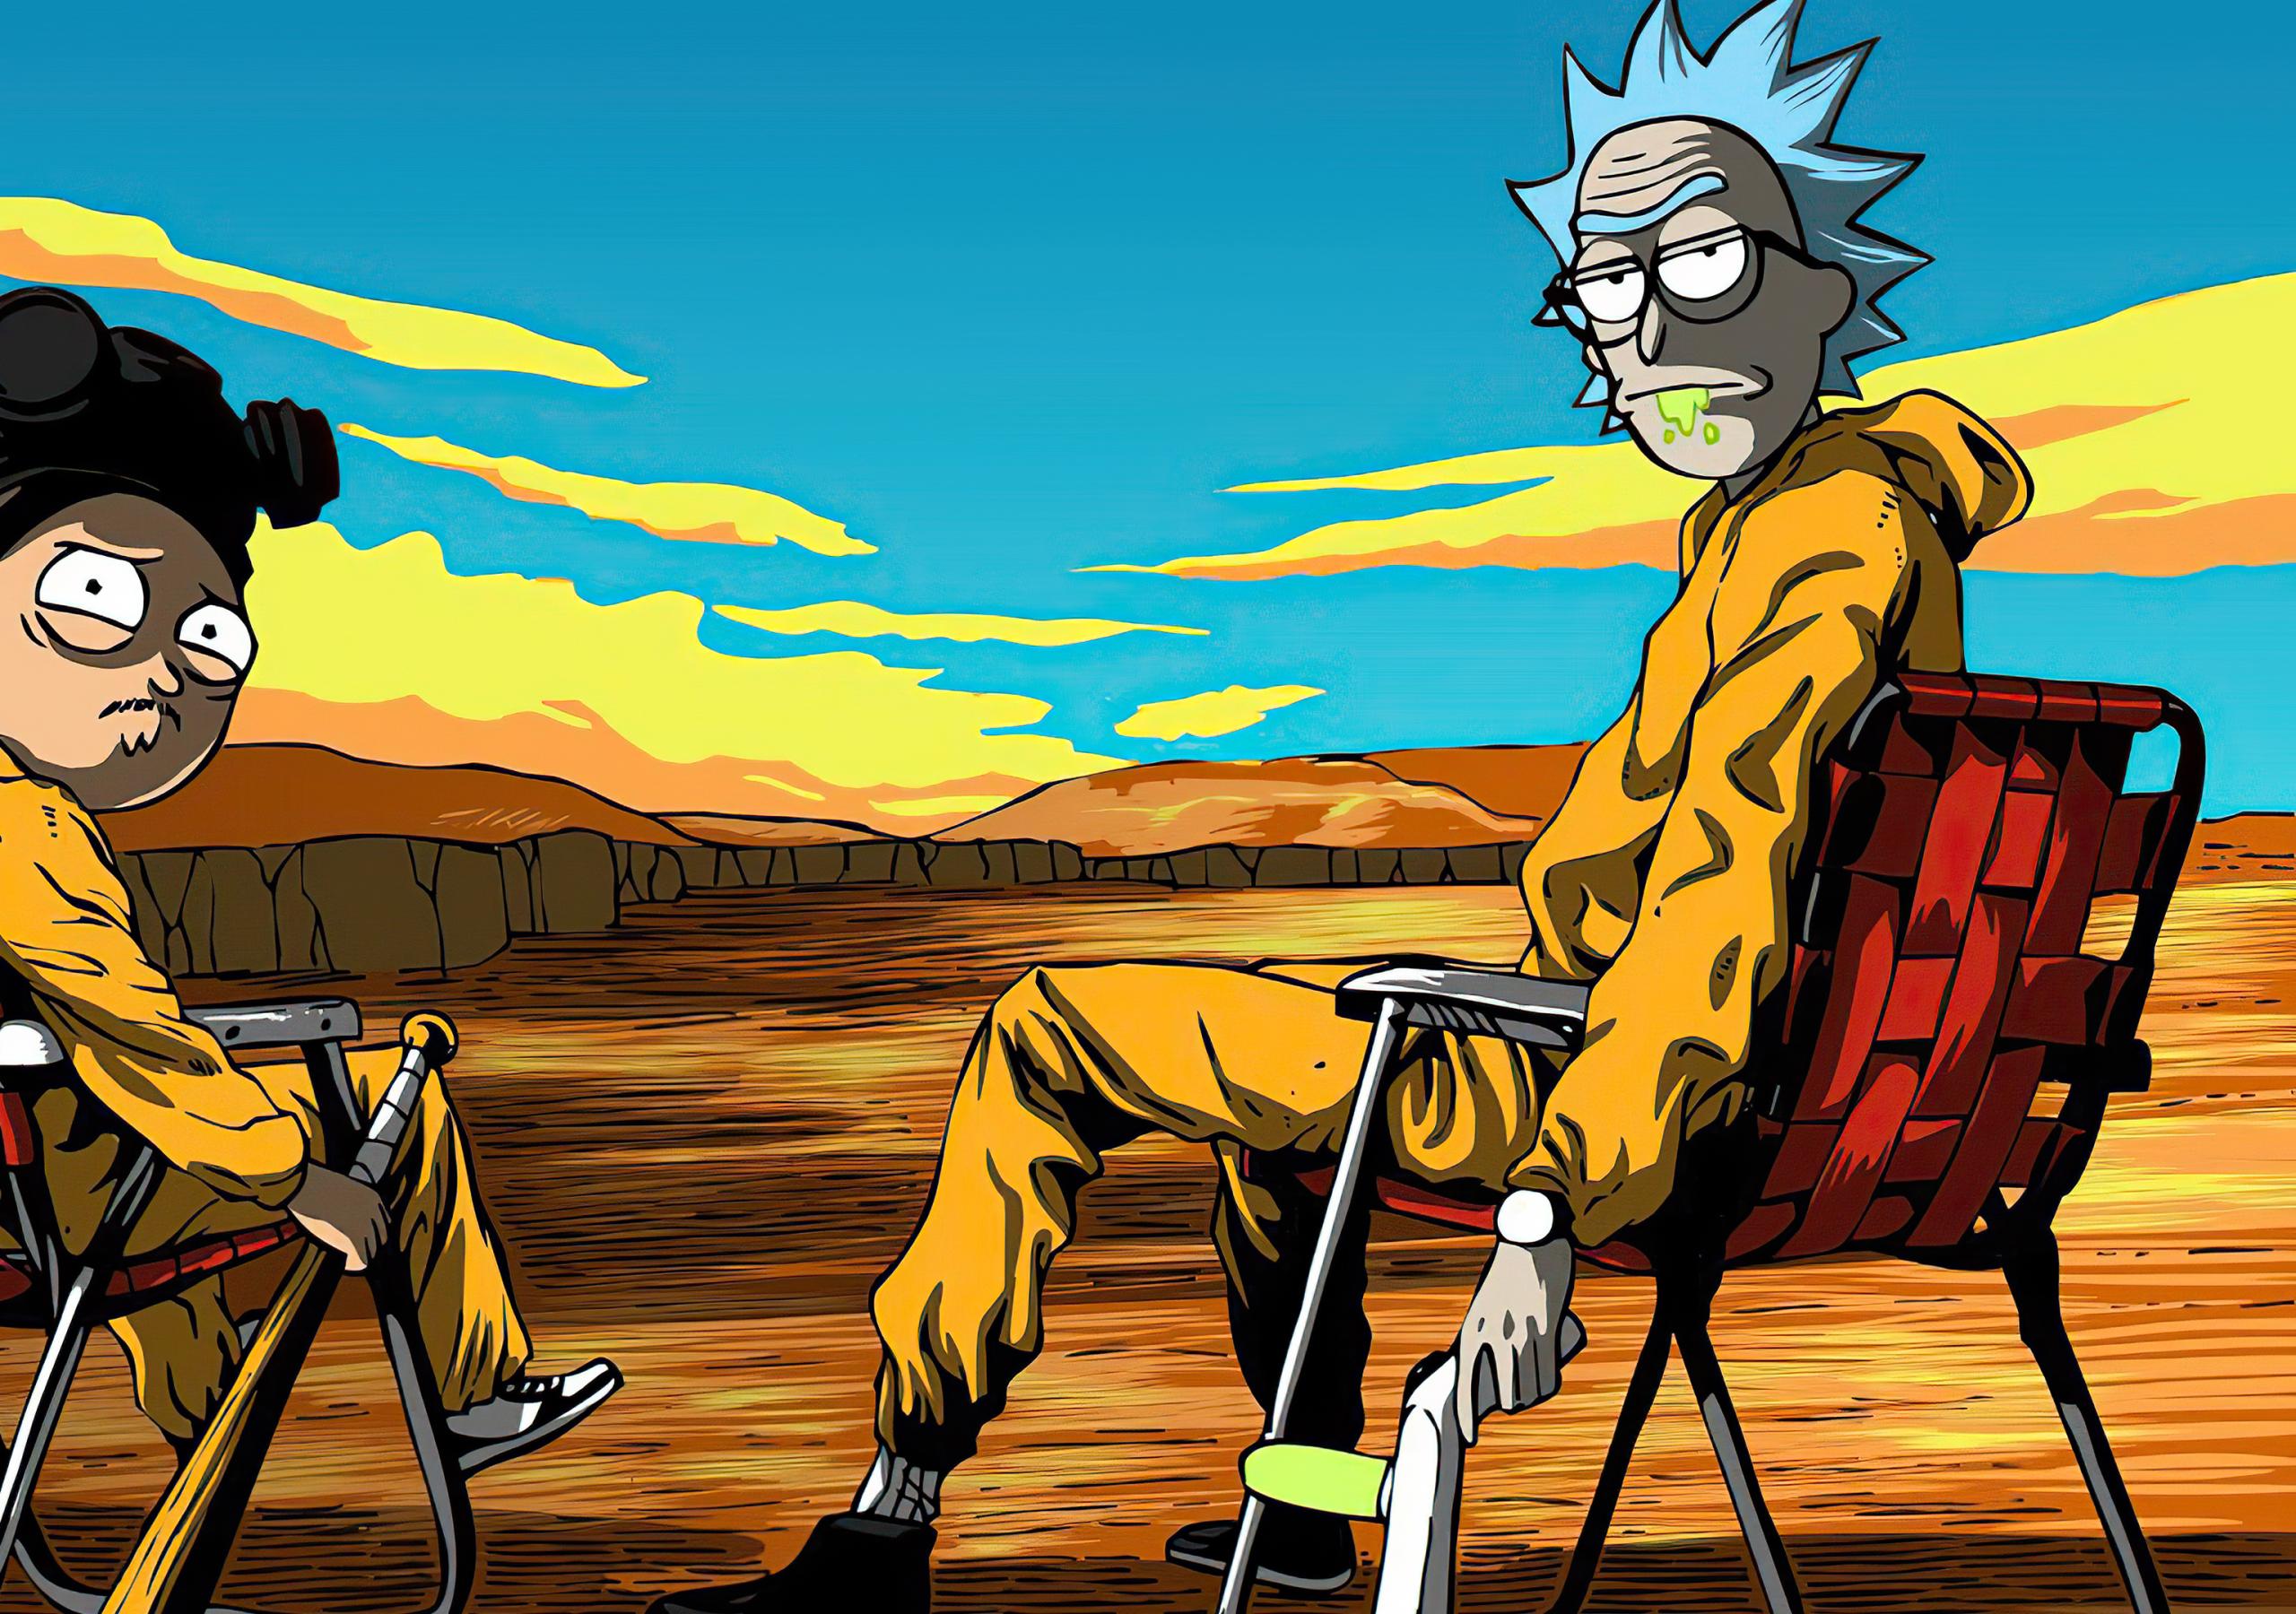 2560x1800 Rick & Morty X Breaking Bad 2560x1800 Resolution ...